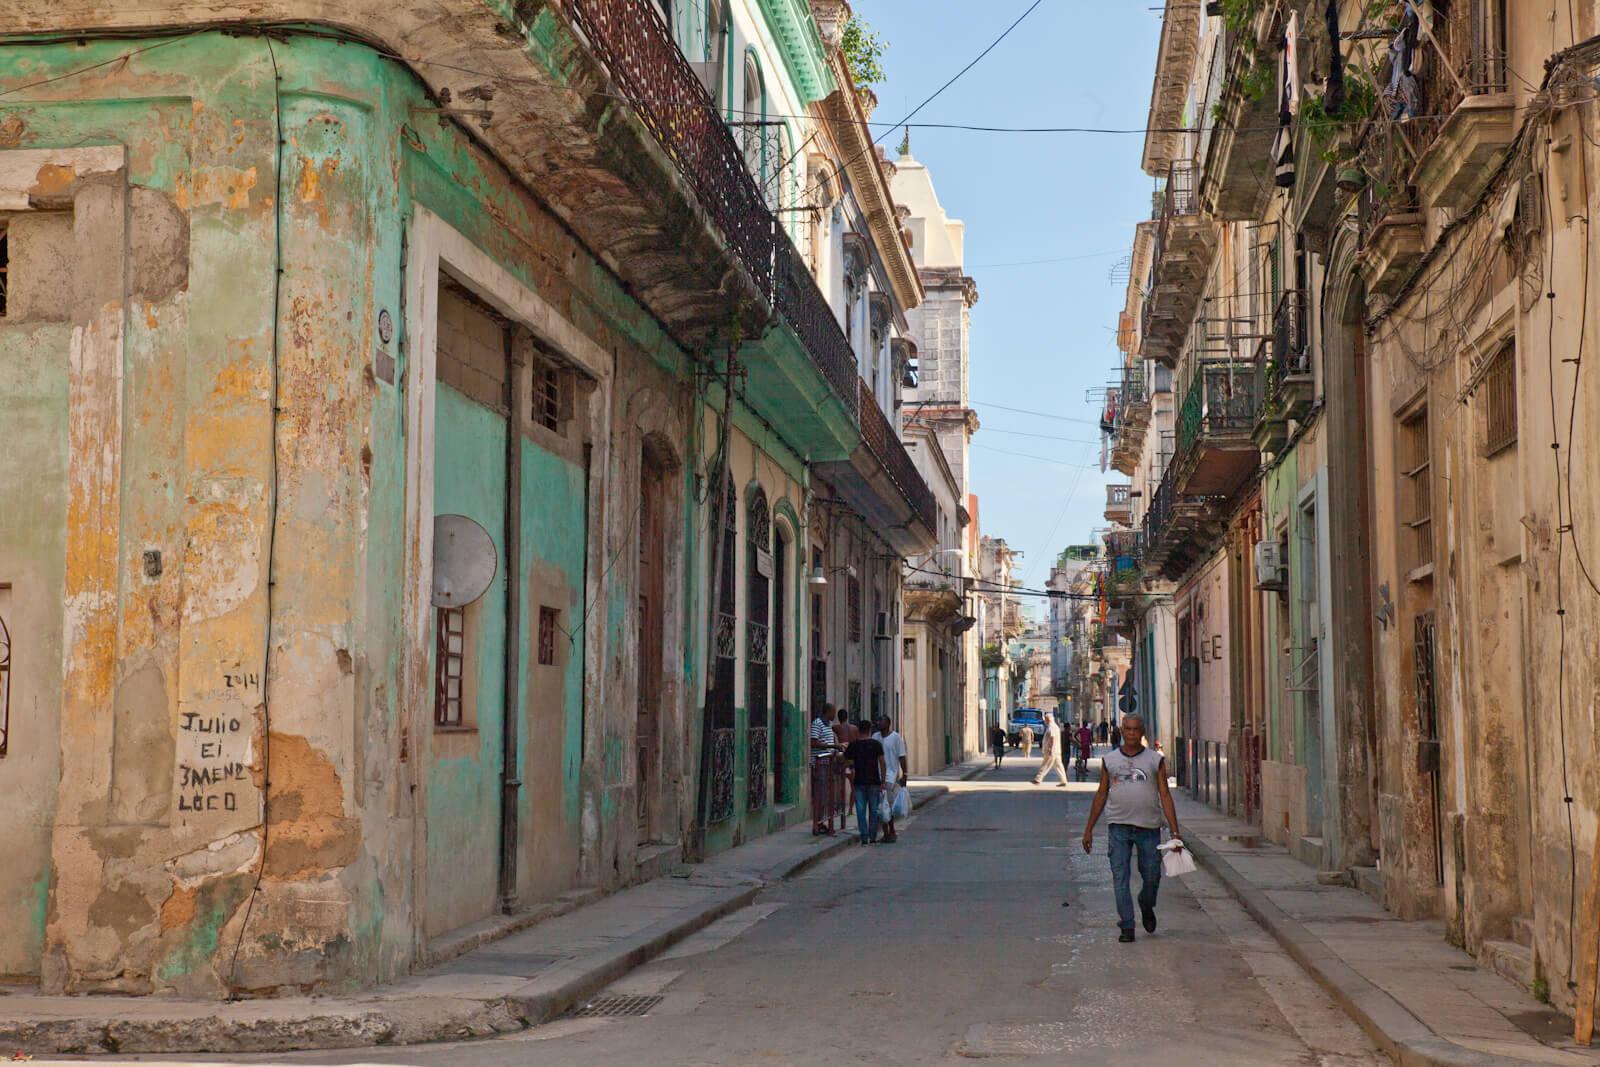 Old Havana is a UNESCO World Heritage Site. © Brian J. Hutchinson